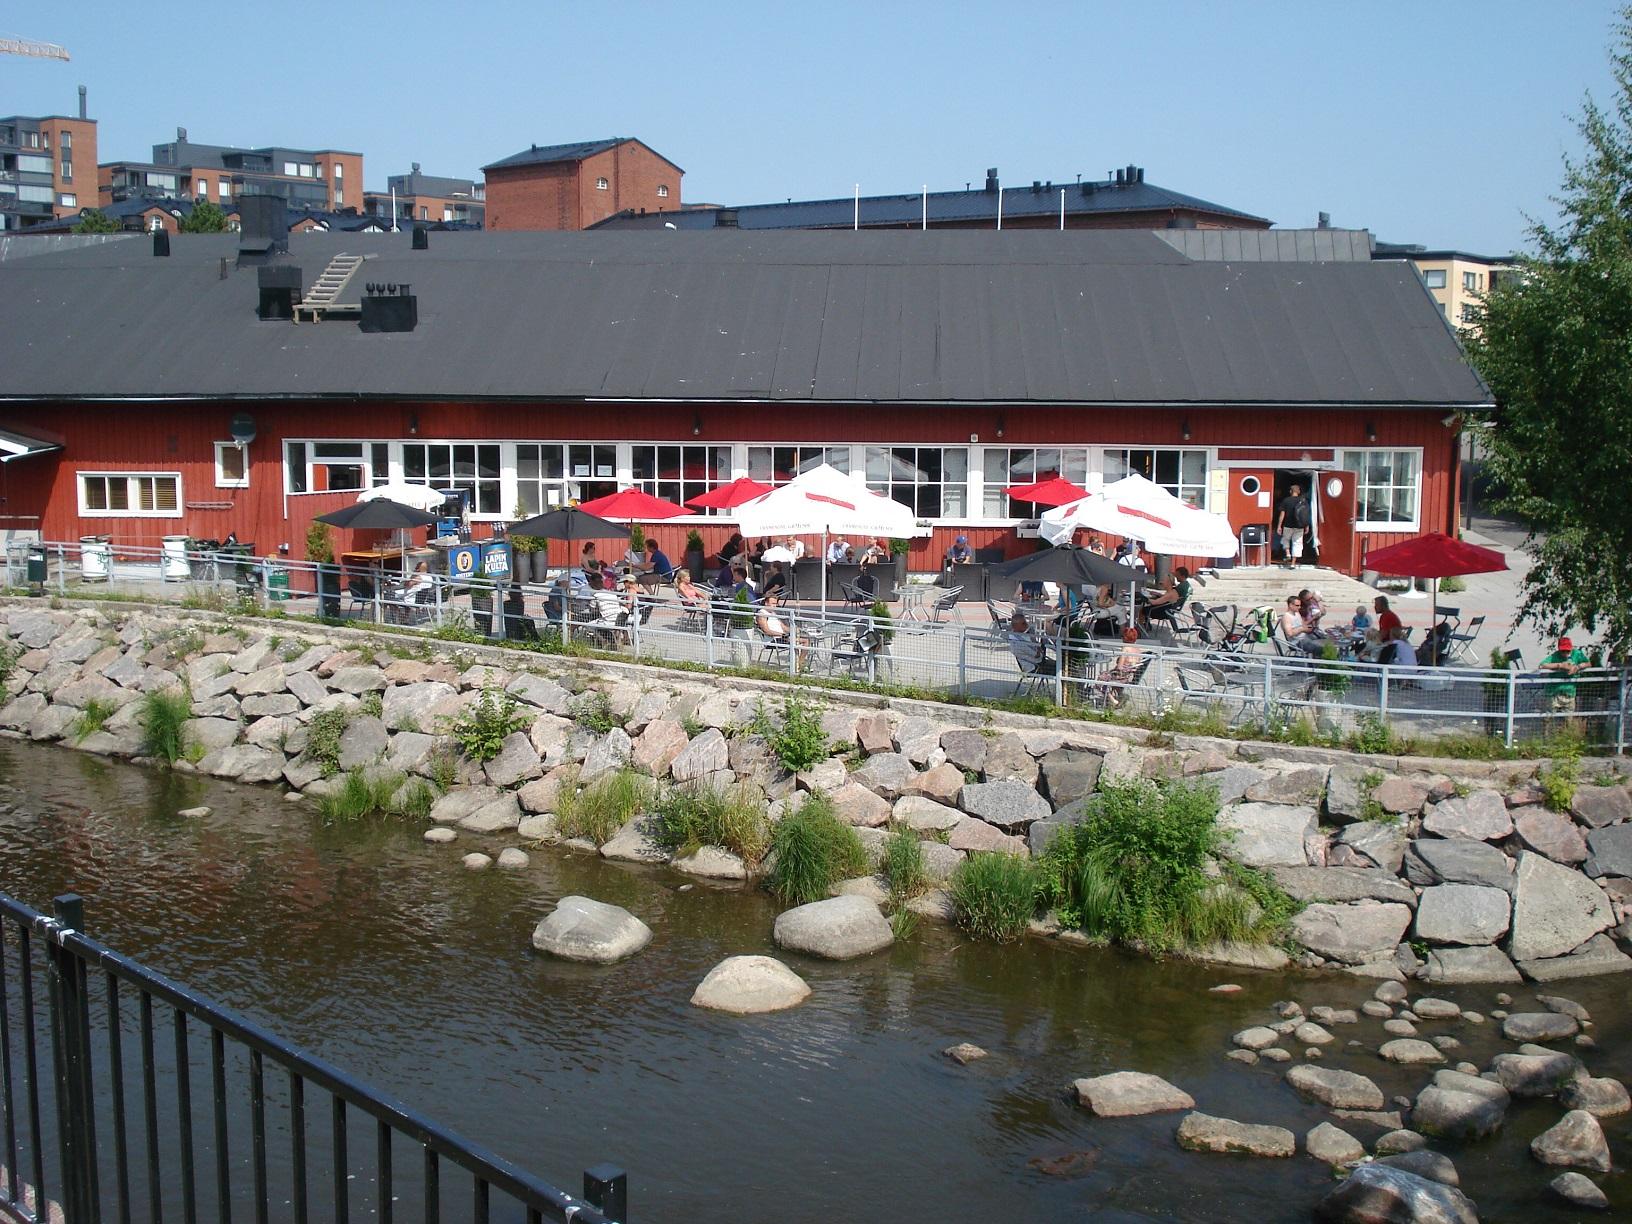 Café in Helsinki Vanhakaupunki